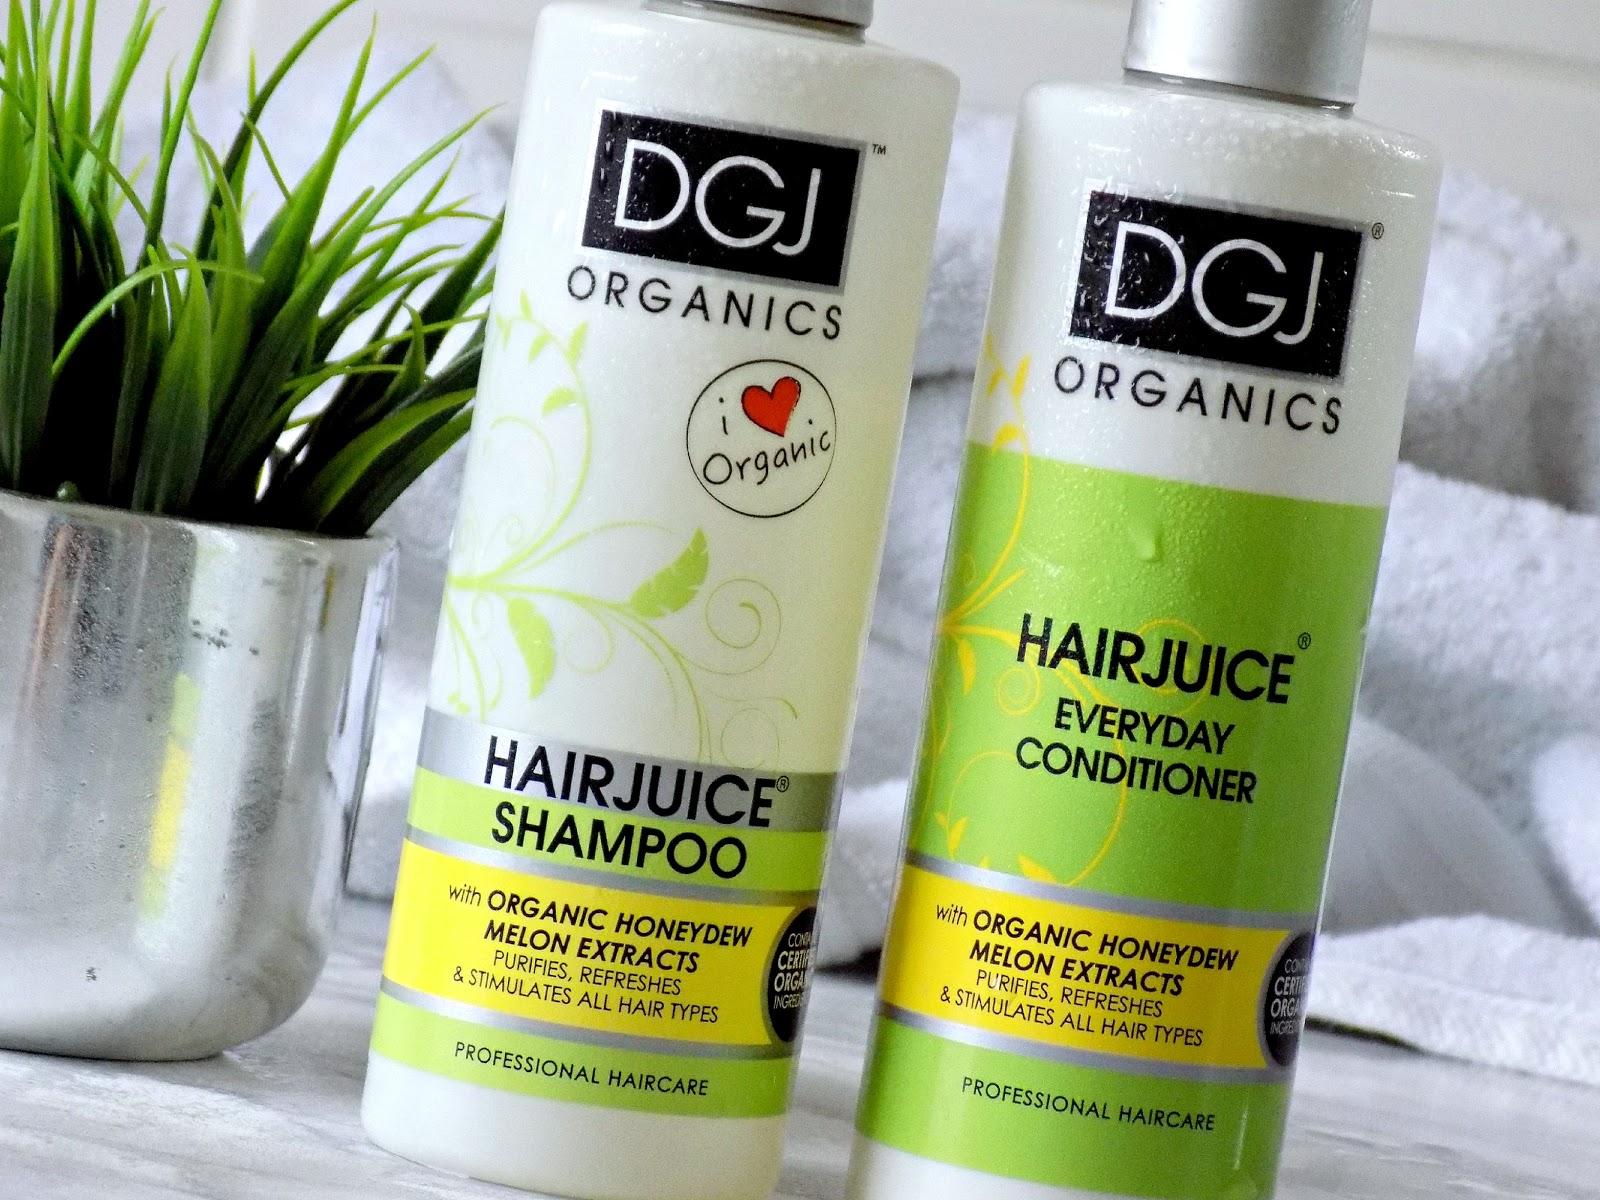 Makeup Revolution DGJ Organics shampoo